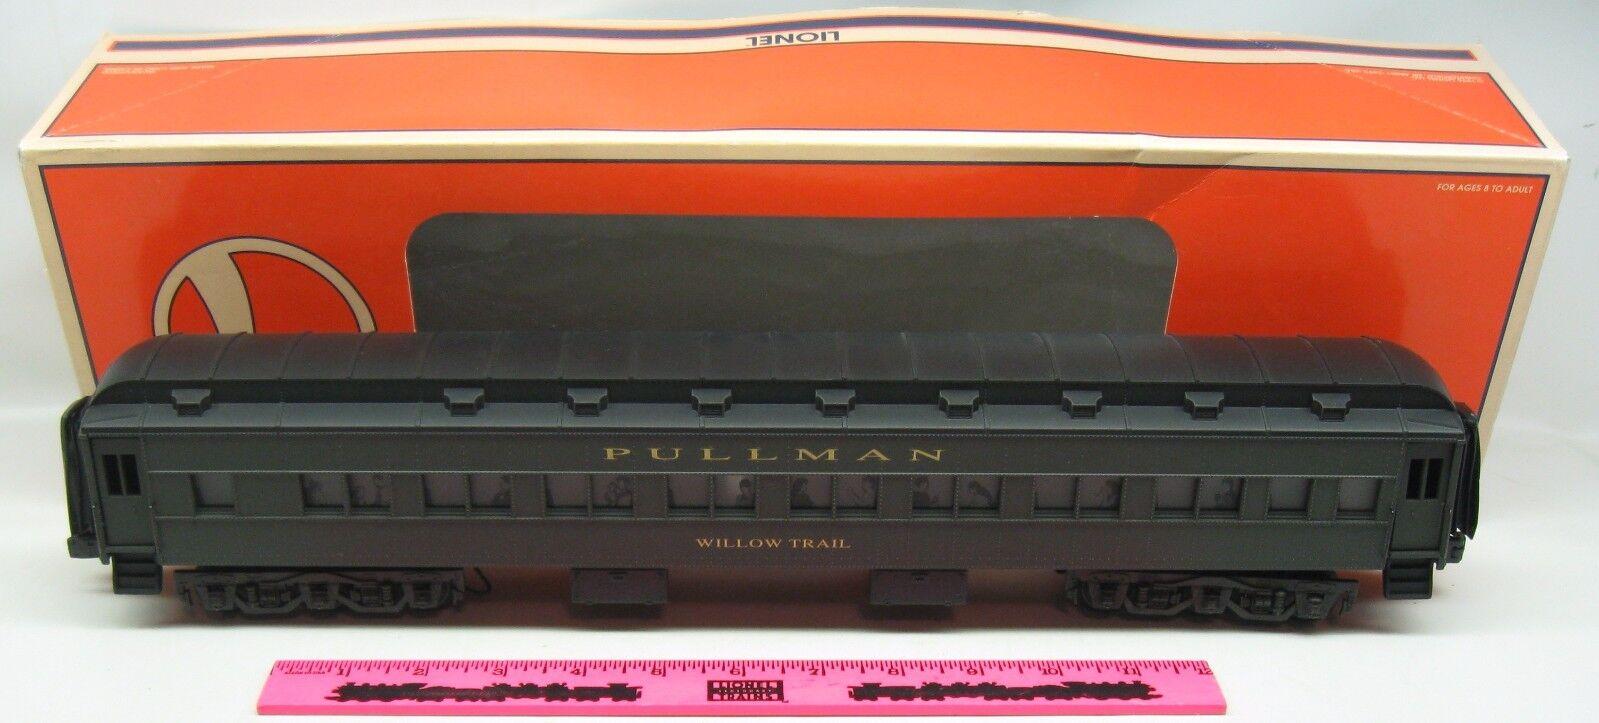 Lionel  6-19058 Pullman Heavyweight Passenger car